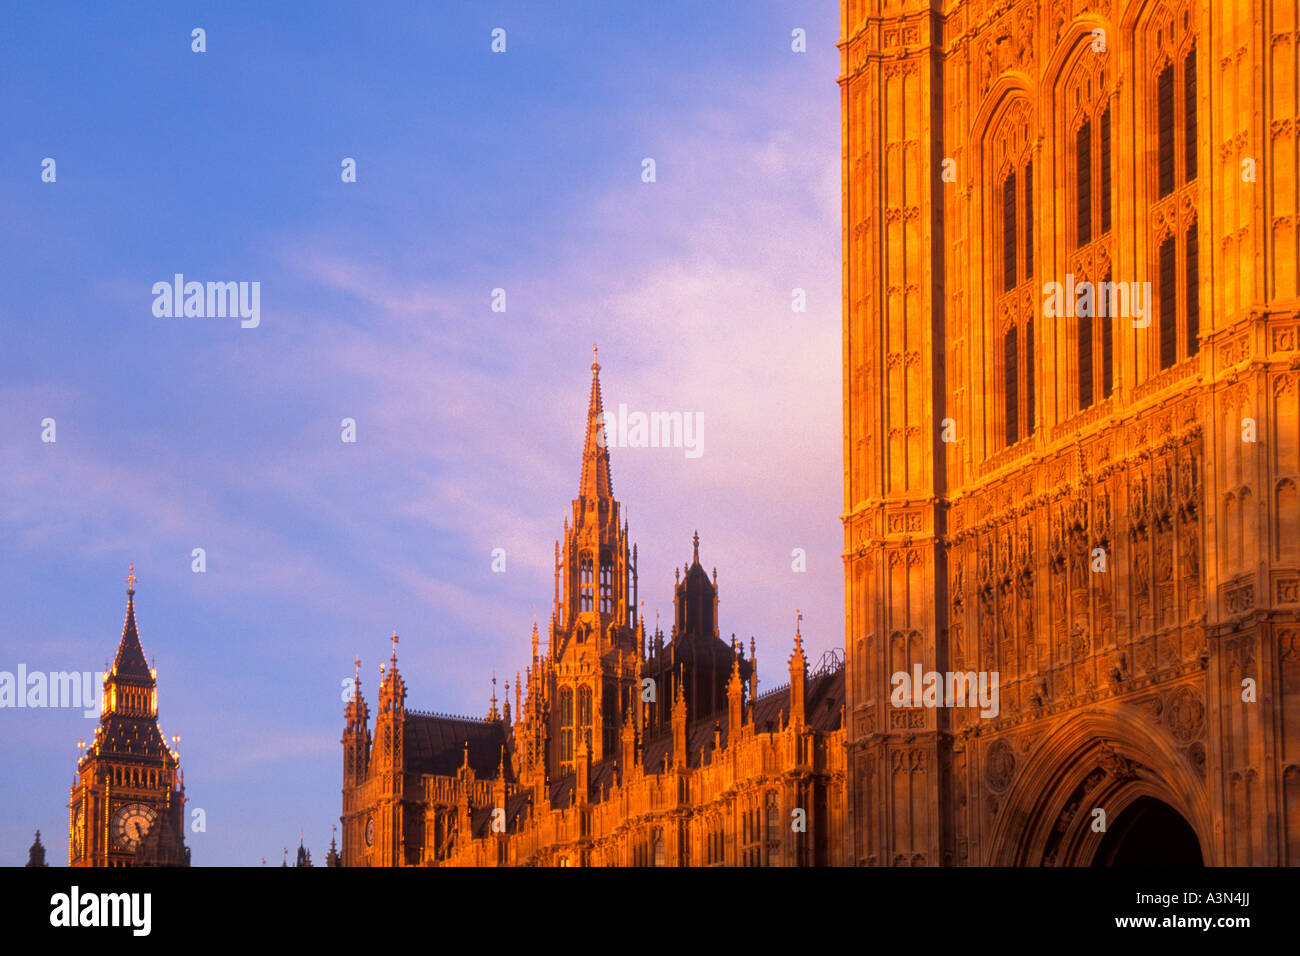 Europe England United Kingdom UK The Houses of Parliament and Big Ben at Dusk Sandra Baker - Stock Image